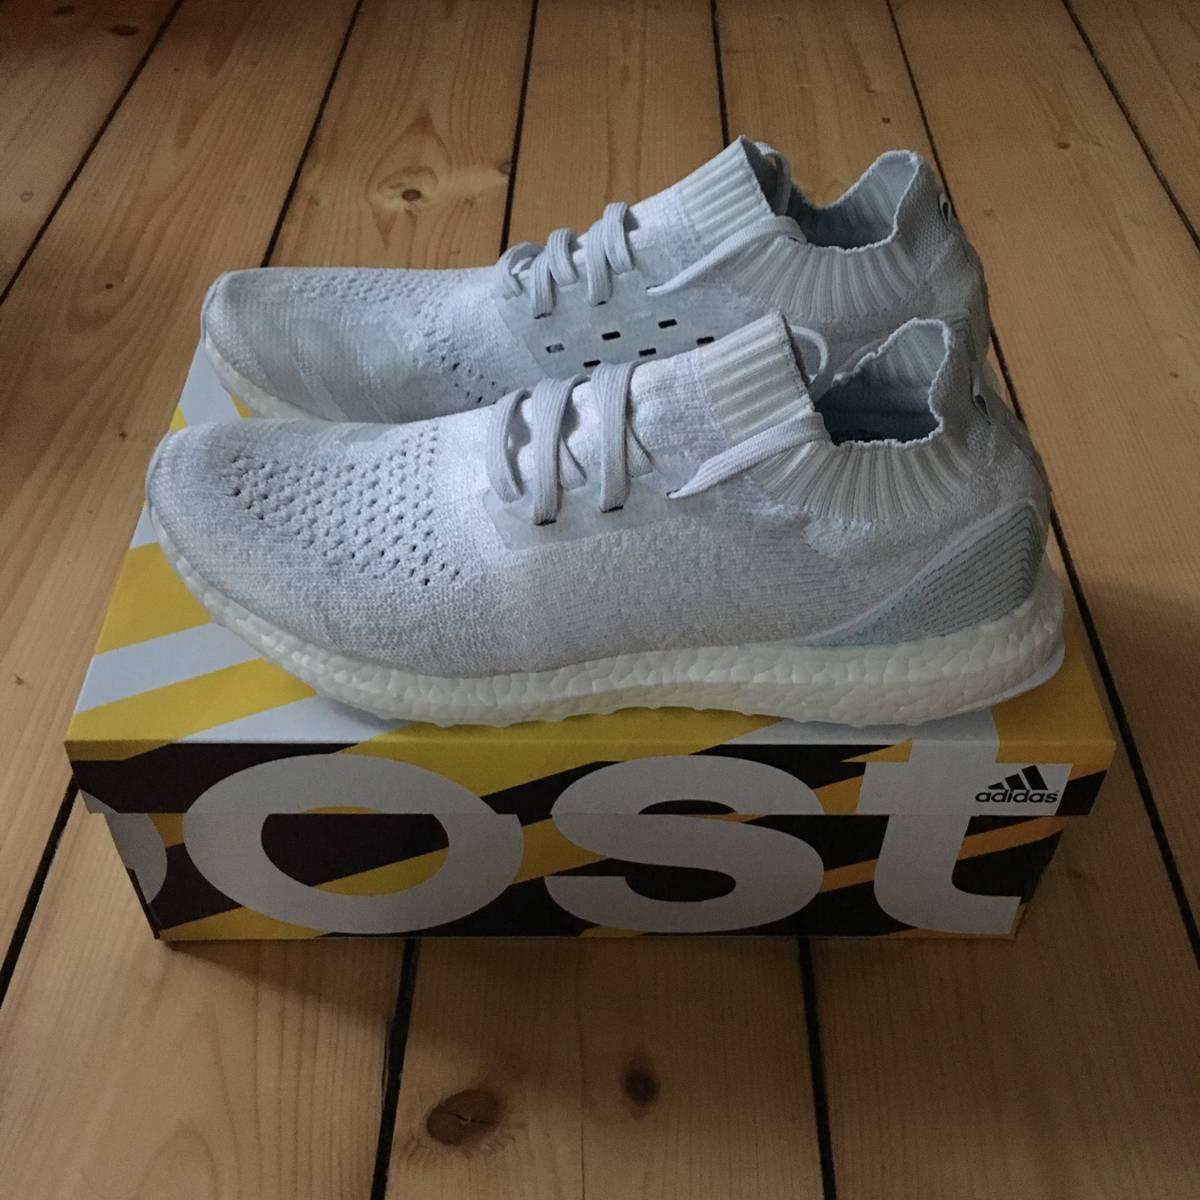 ON FEET: Adidas Ultra Boost White